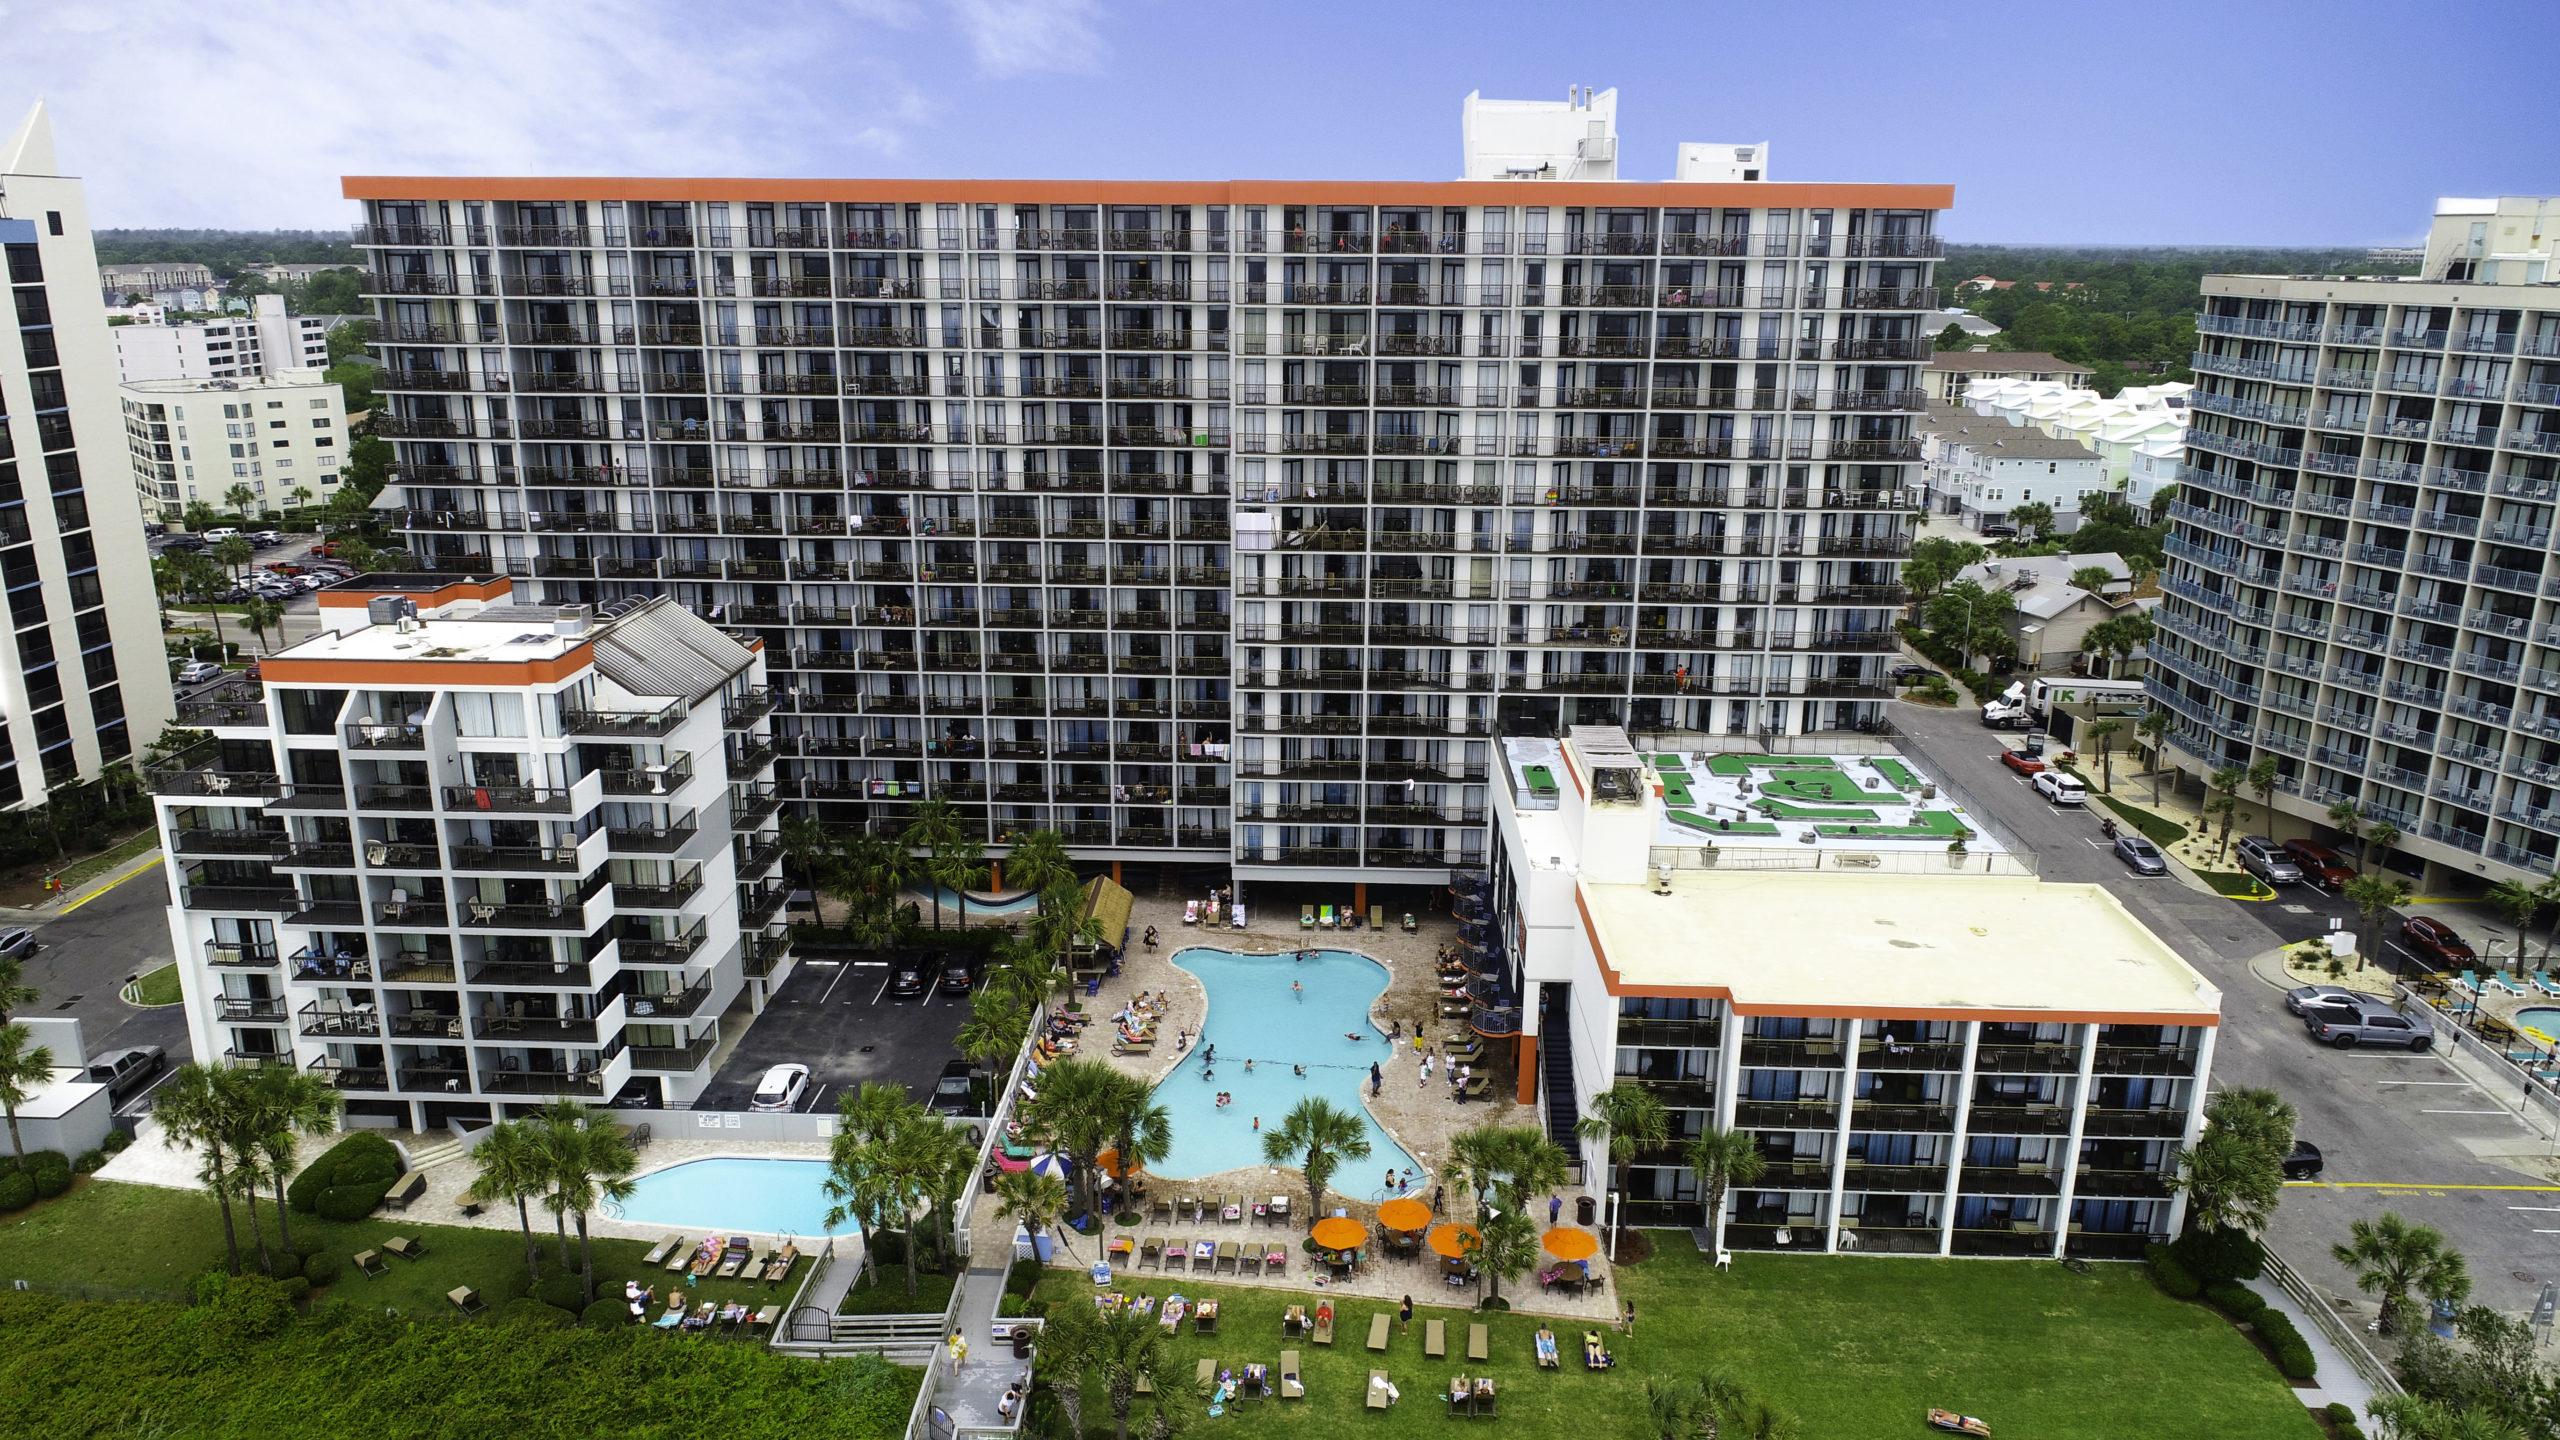 Grande Cayman Resort Drone Photo